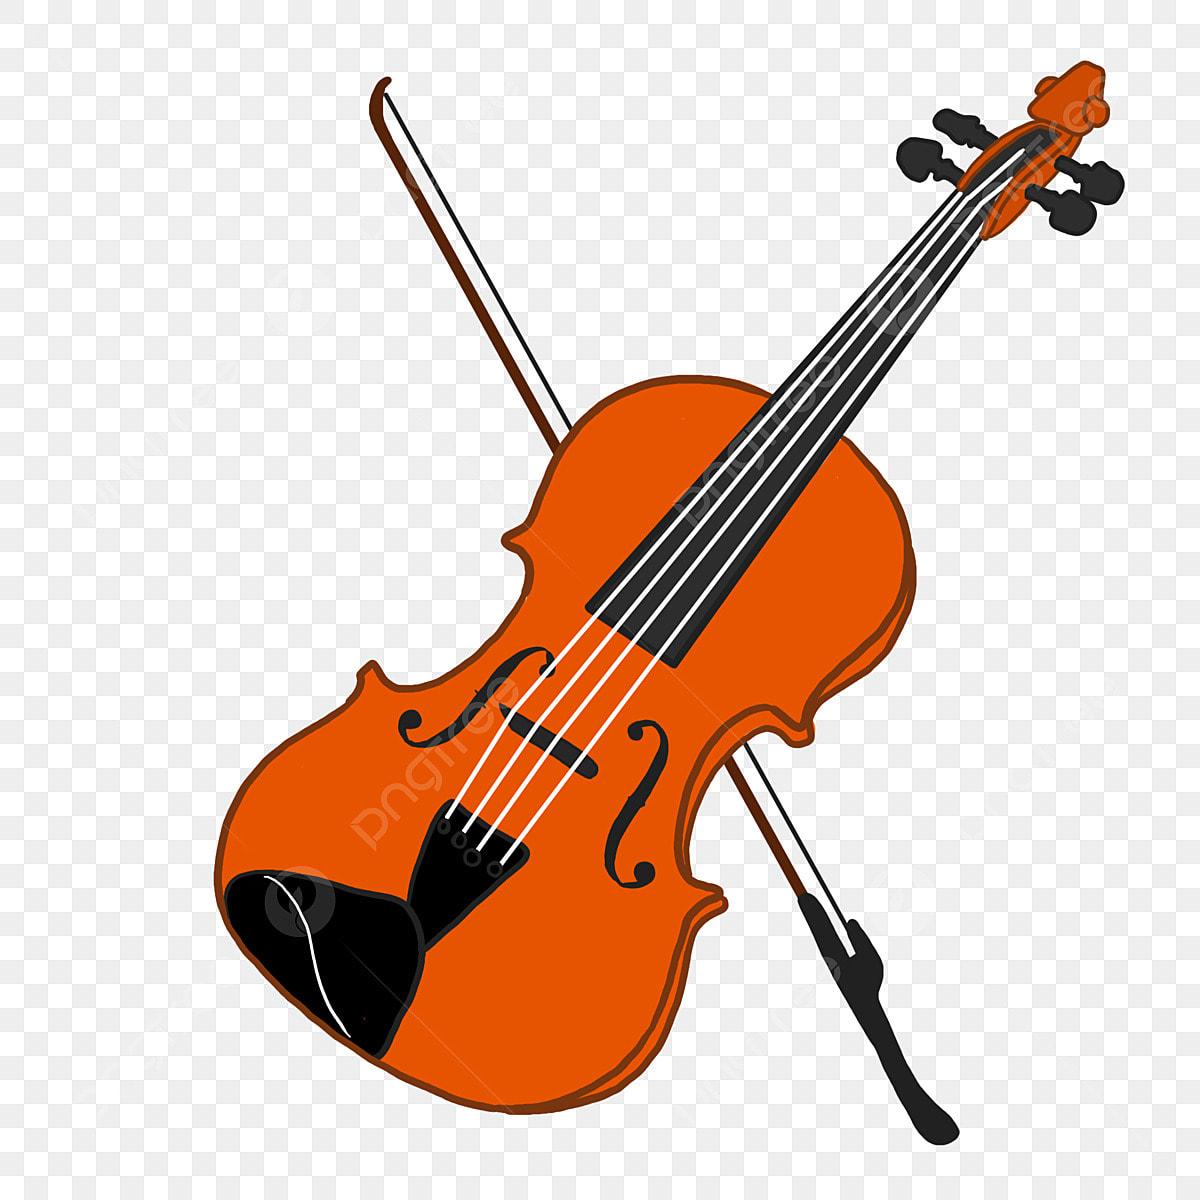 Musical Instrument Cello Illustration Cello Musical